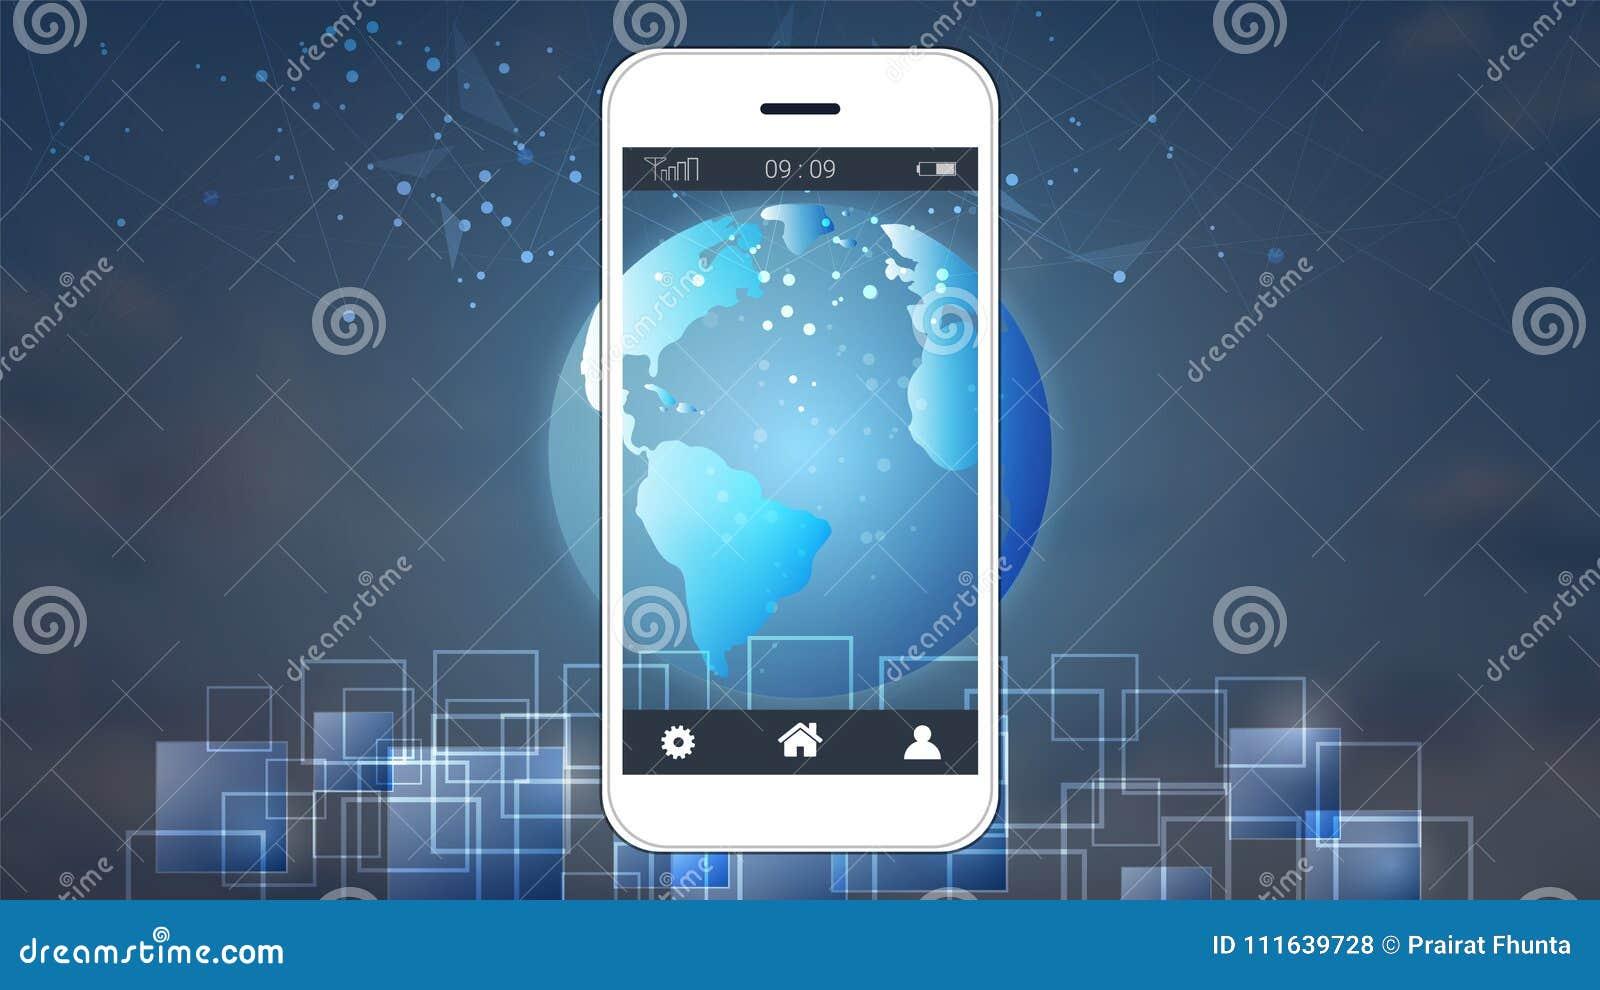 Smart phone screen showing digital circuit boards and world map smart phone screen showing digital circuit boards and world map background publicscrutiny Choice Image